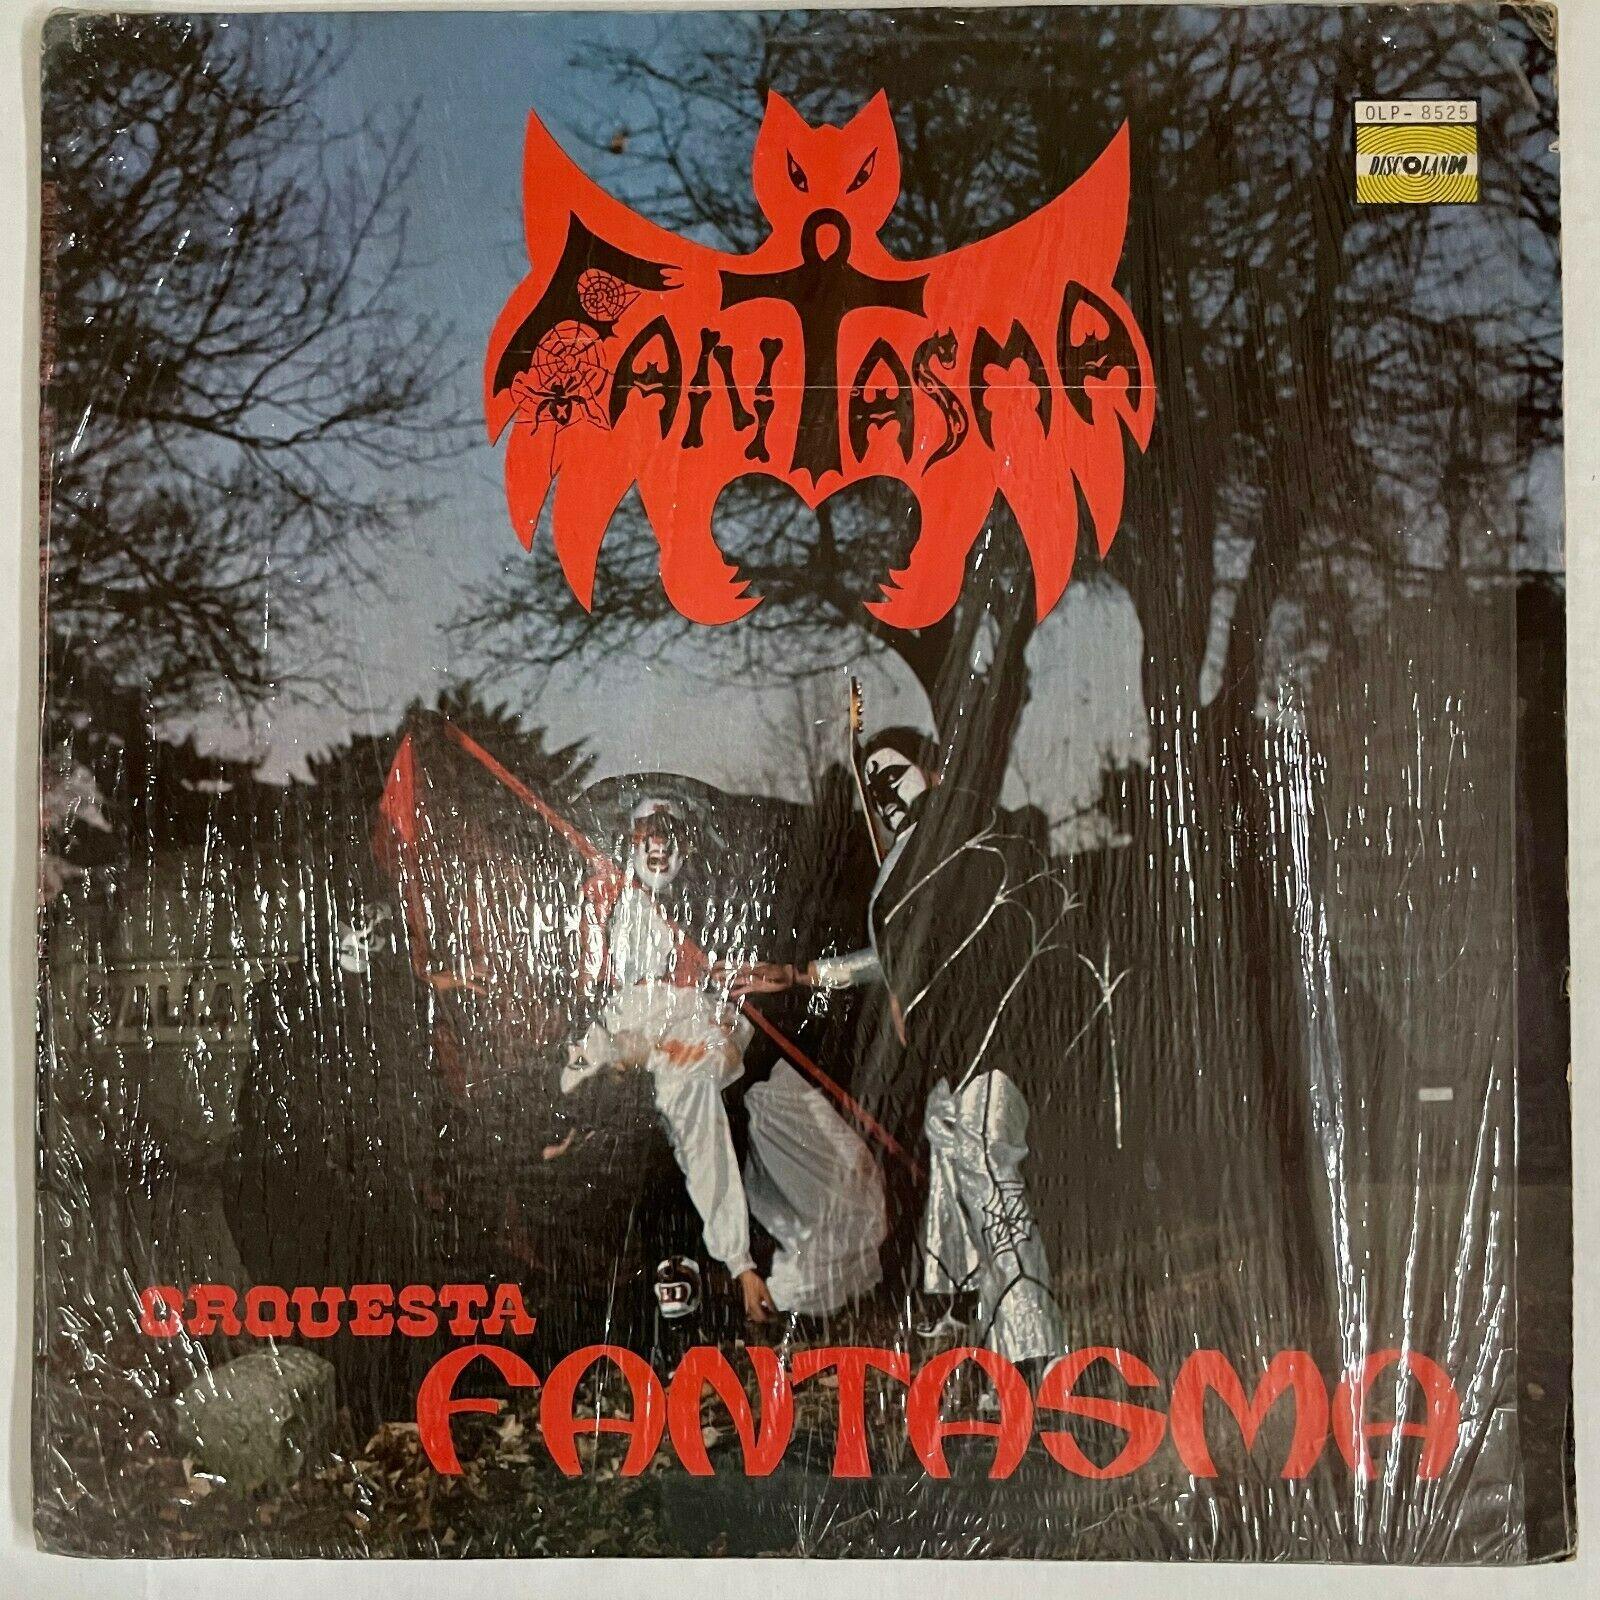 ORQUESTA FANTASMA - Fantasma - MONSTER GUAGUANCO SALSA VENEZUELA LP original